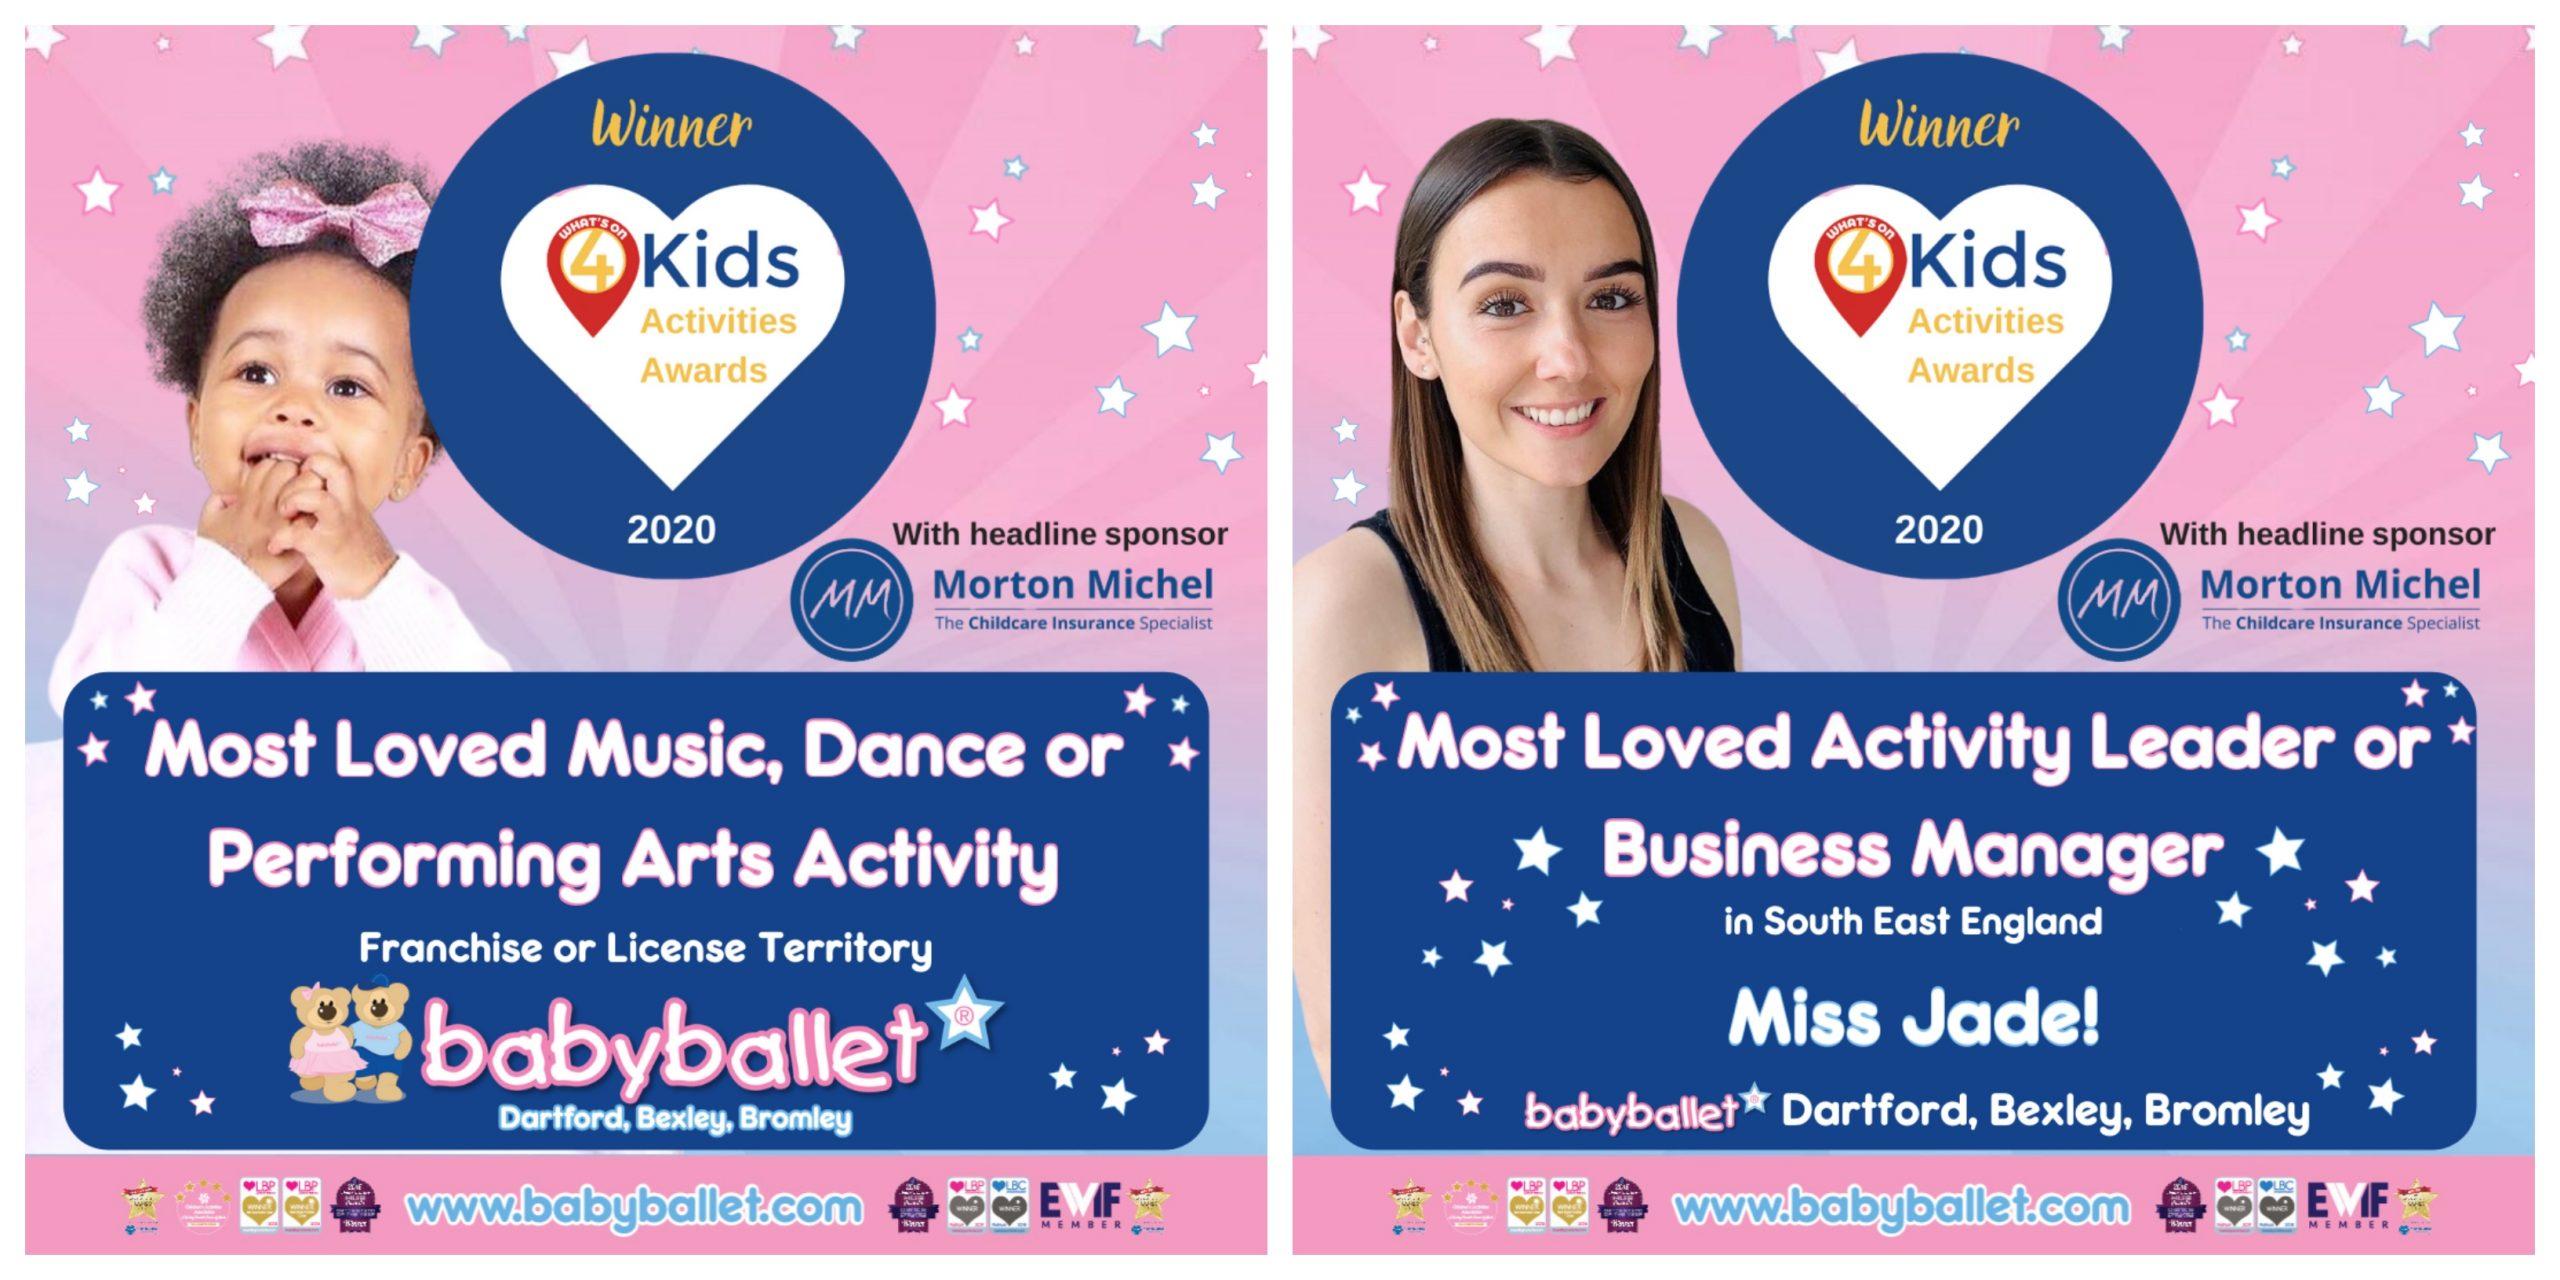 Dartford, Bexley, Bromley - babyballet WINNERS - WO4 Kids Activity Awards 2020